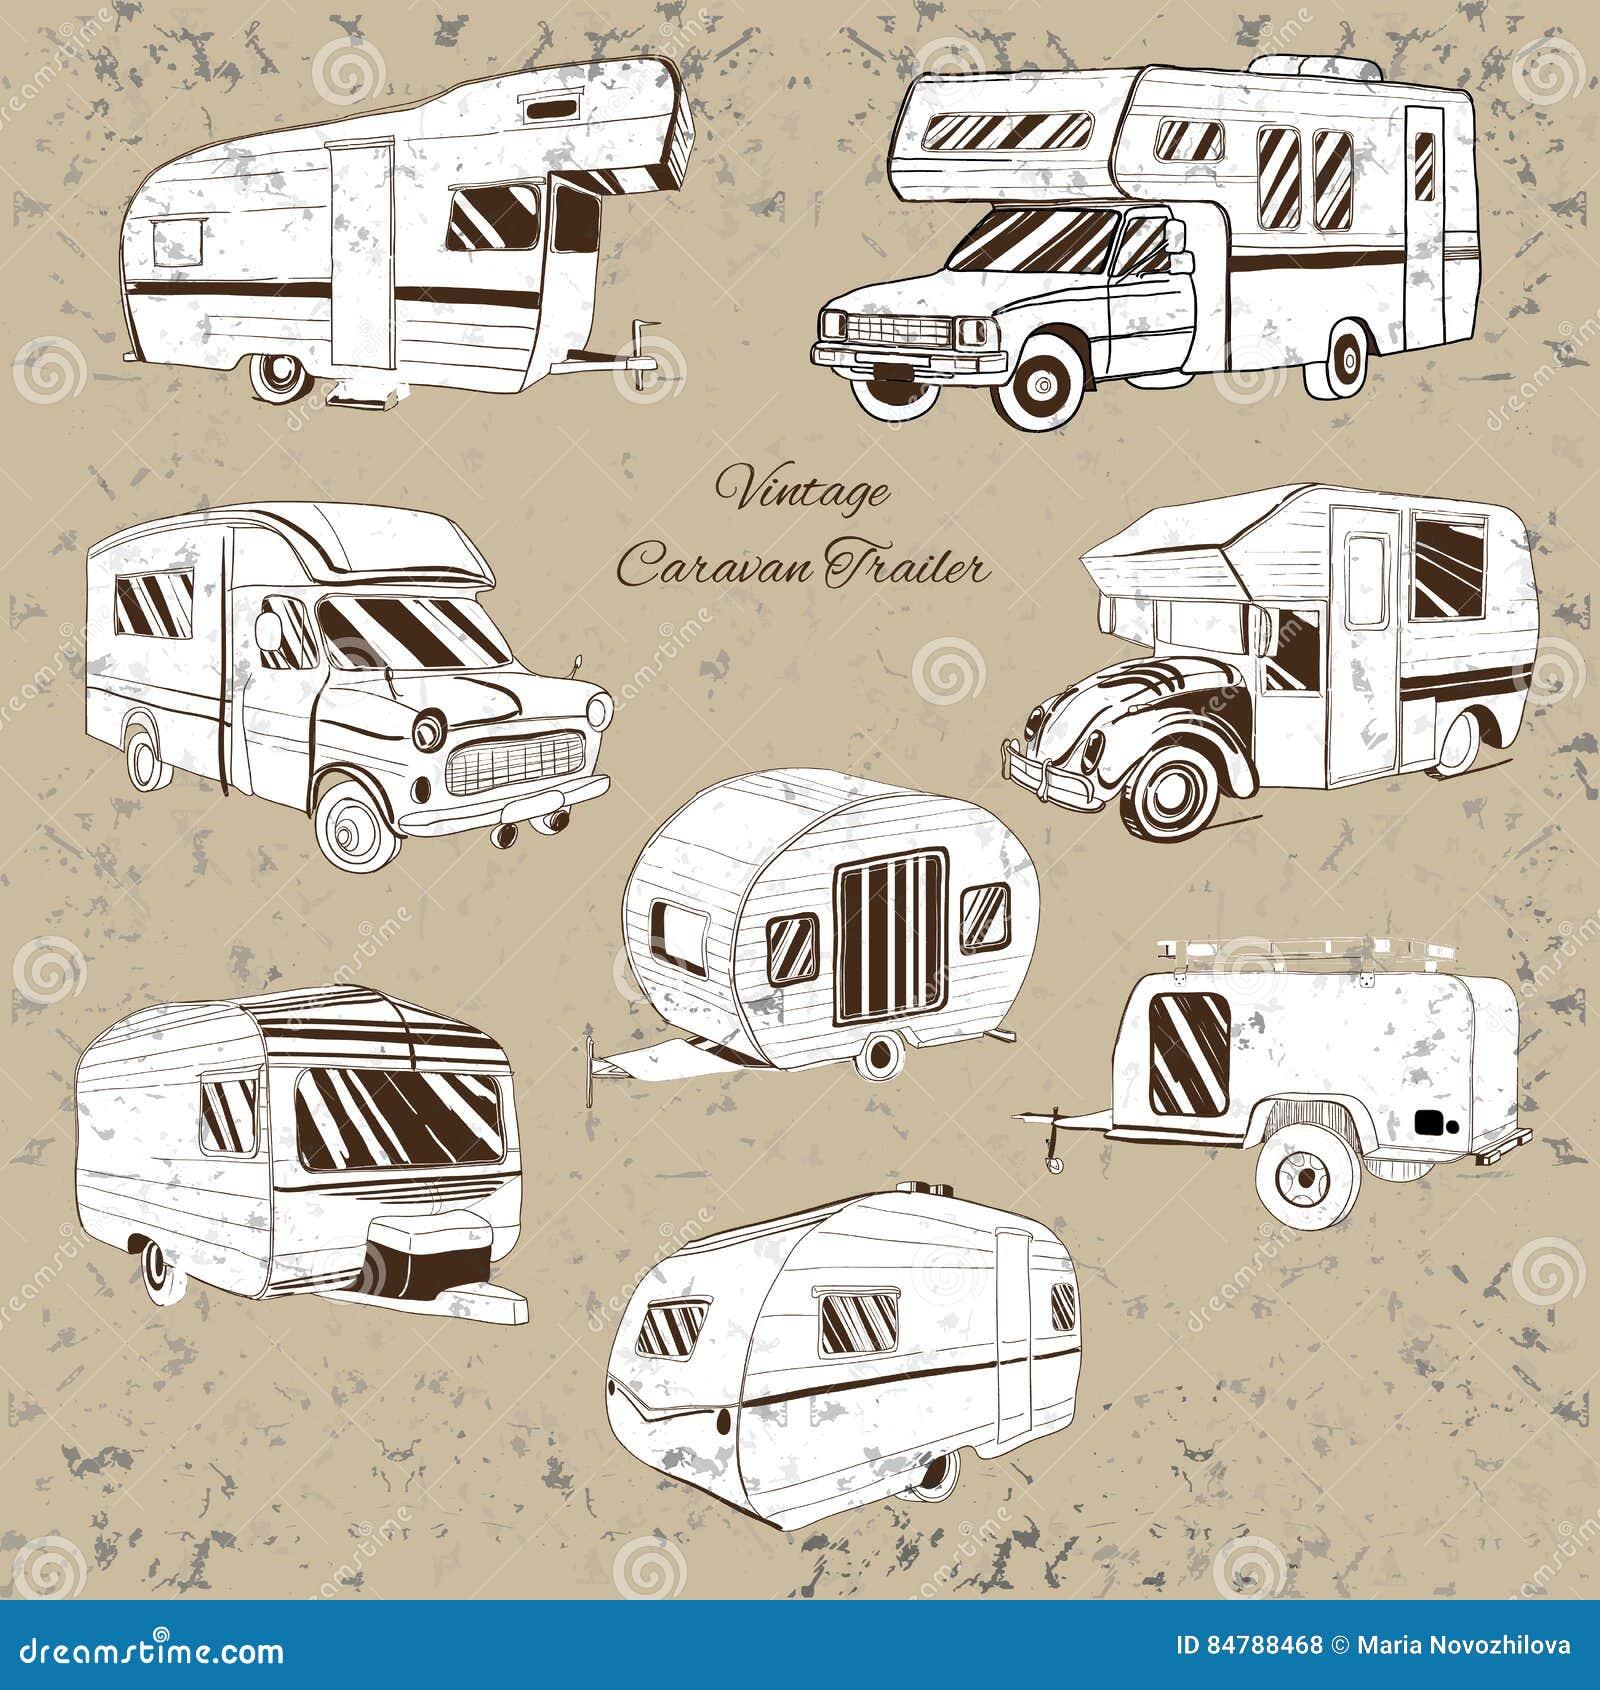 Download Vintage Set Isolated Hand Drawn Doodle Camper Trailer Car Recreation Transport Vehicles